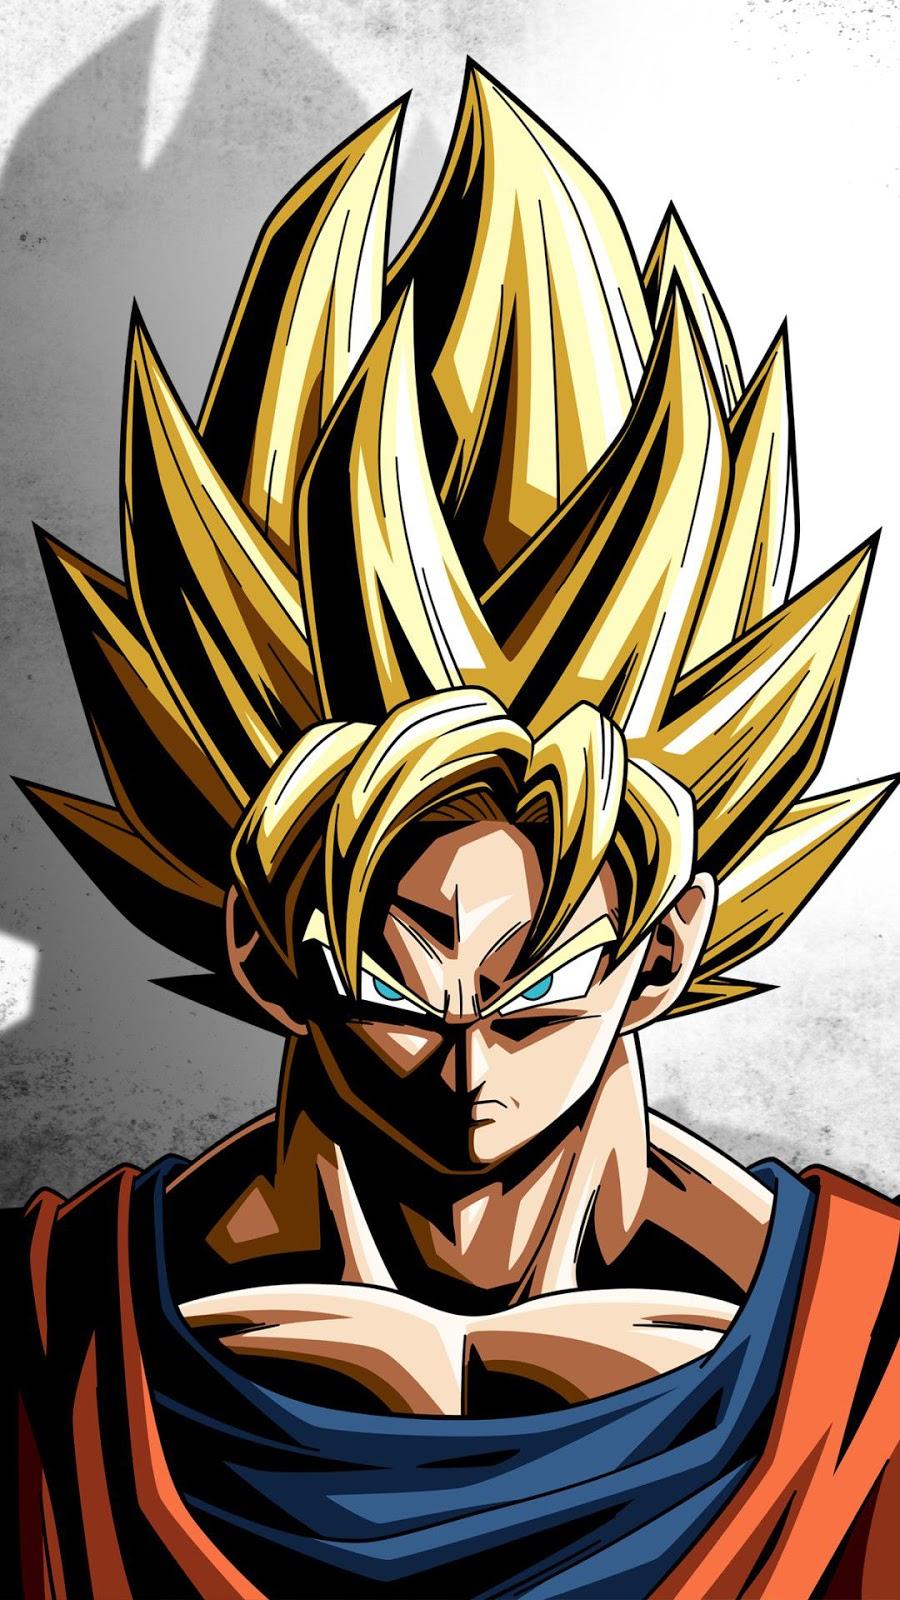 Son Goku Super Saiyan Ii Best Wallpaper Dragon Ball Z For Smartphone